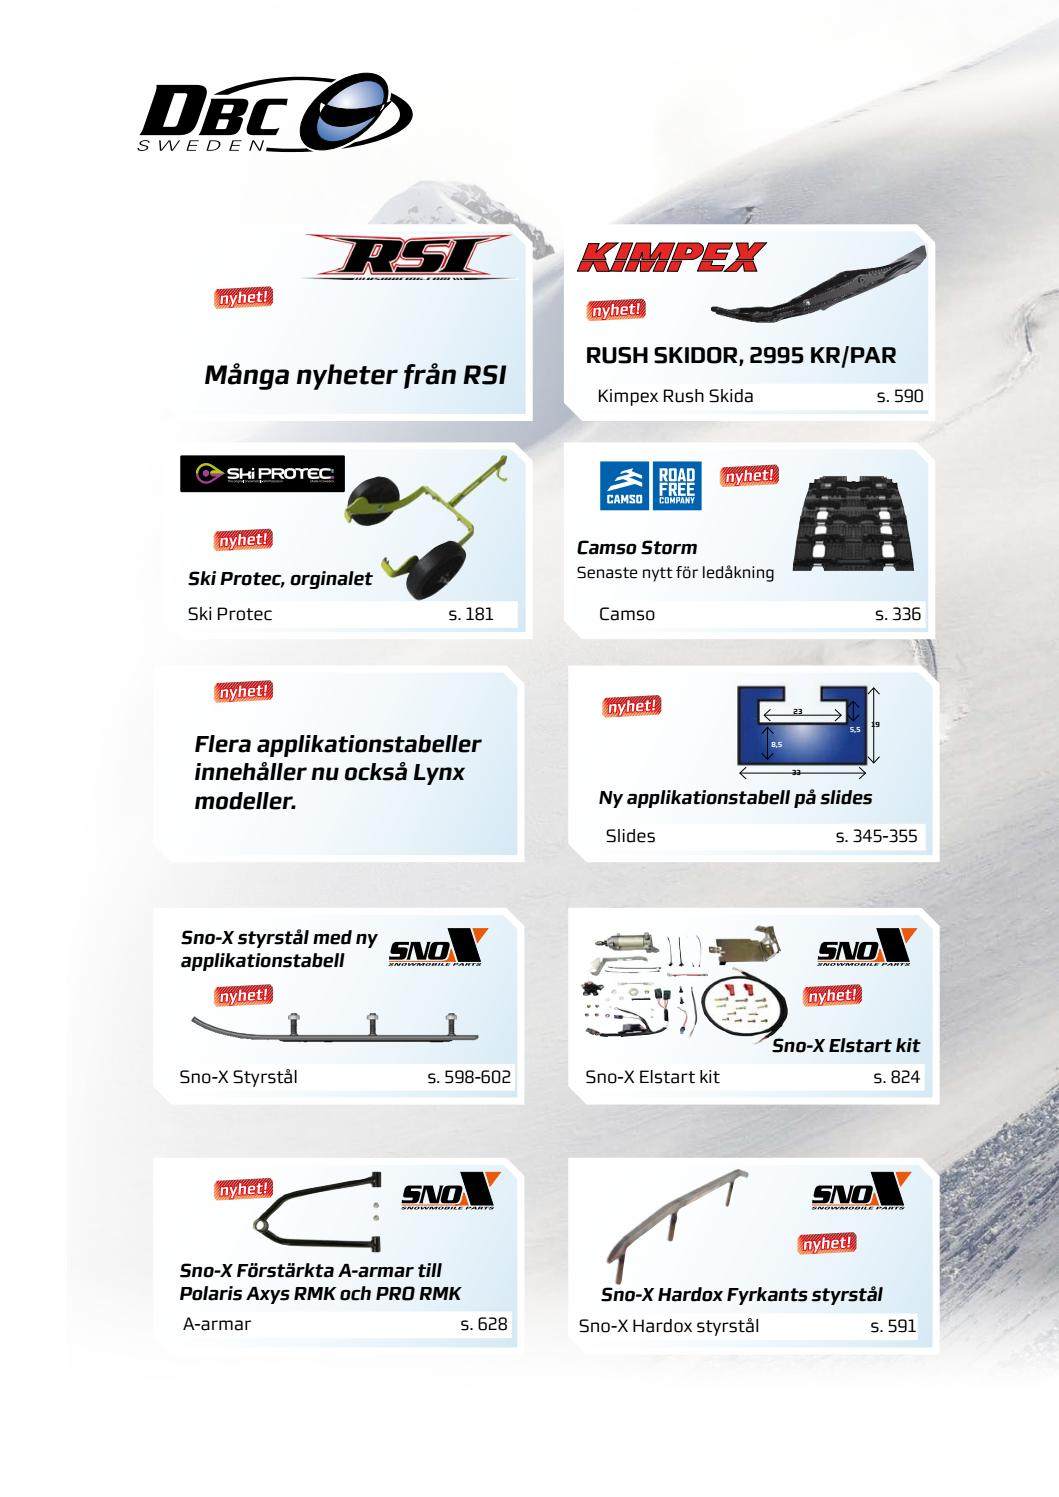 Intake Valve For 2010 Polaris Sportsman 500 HO Touring~Bronco ATV Components